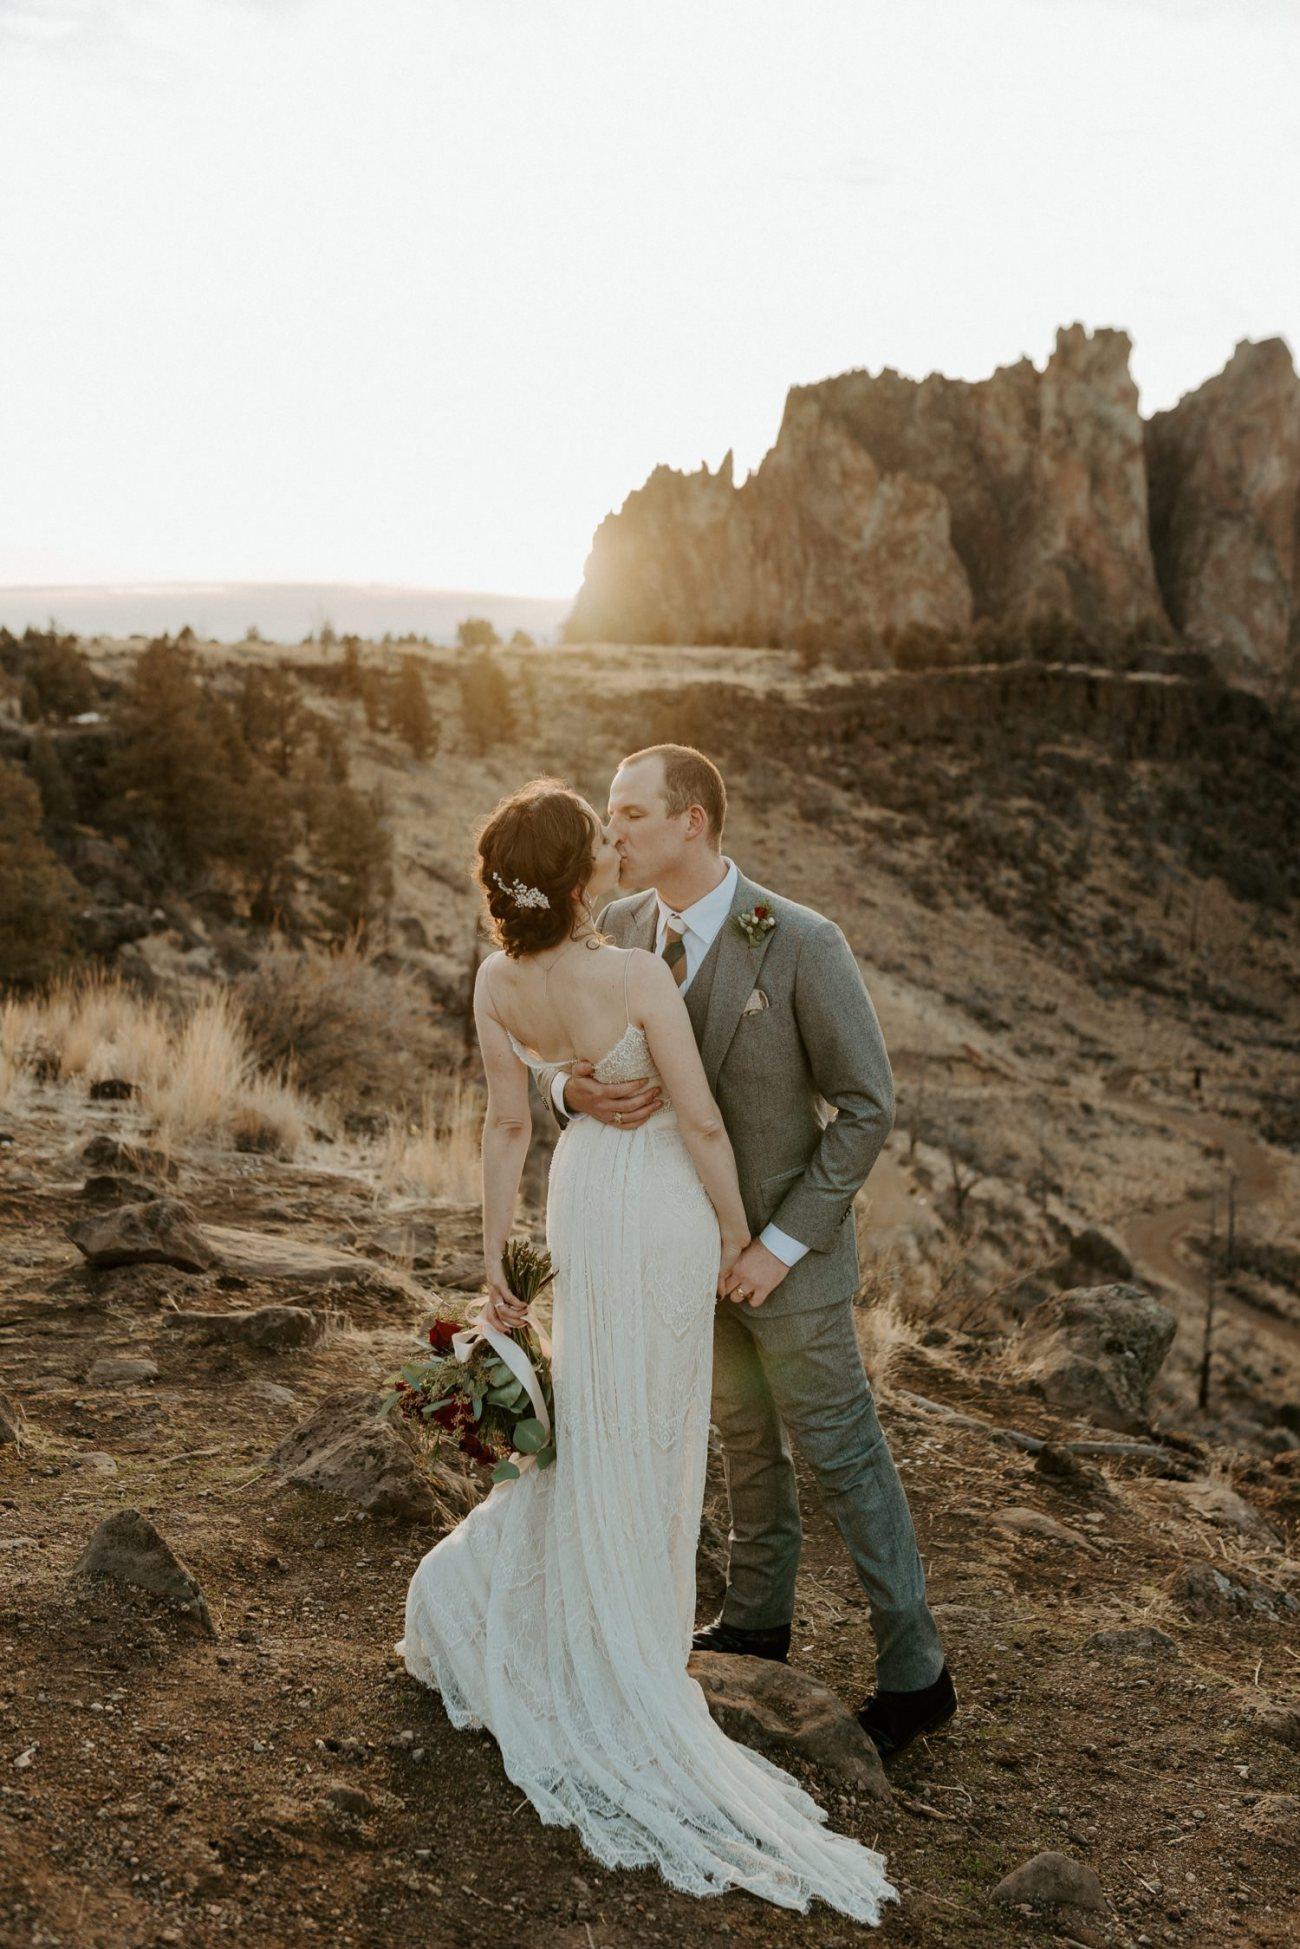 Smith Rock State Park Elopement Bend Oregon Elopement Photographer Anais Possamai Photography 023